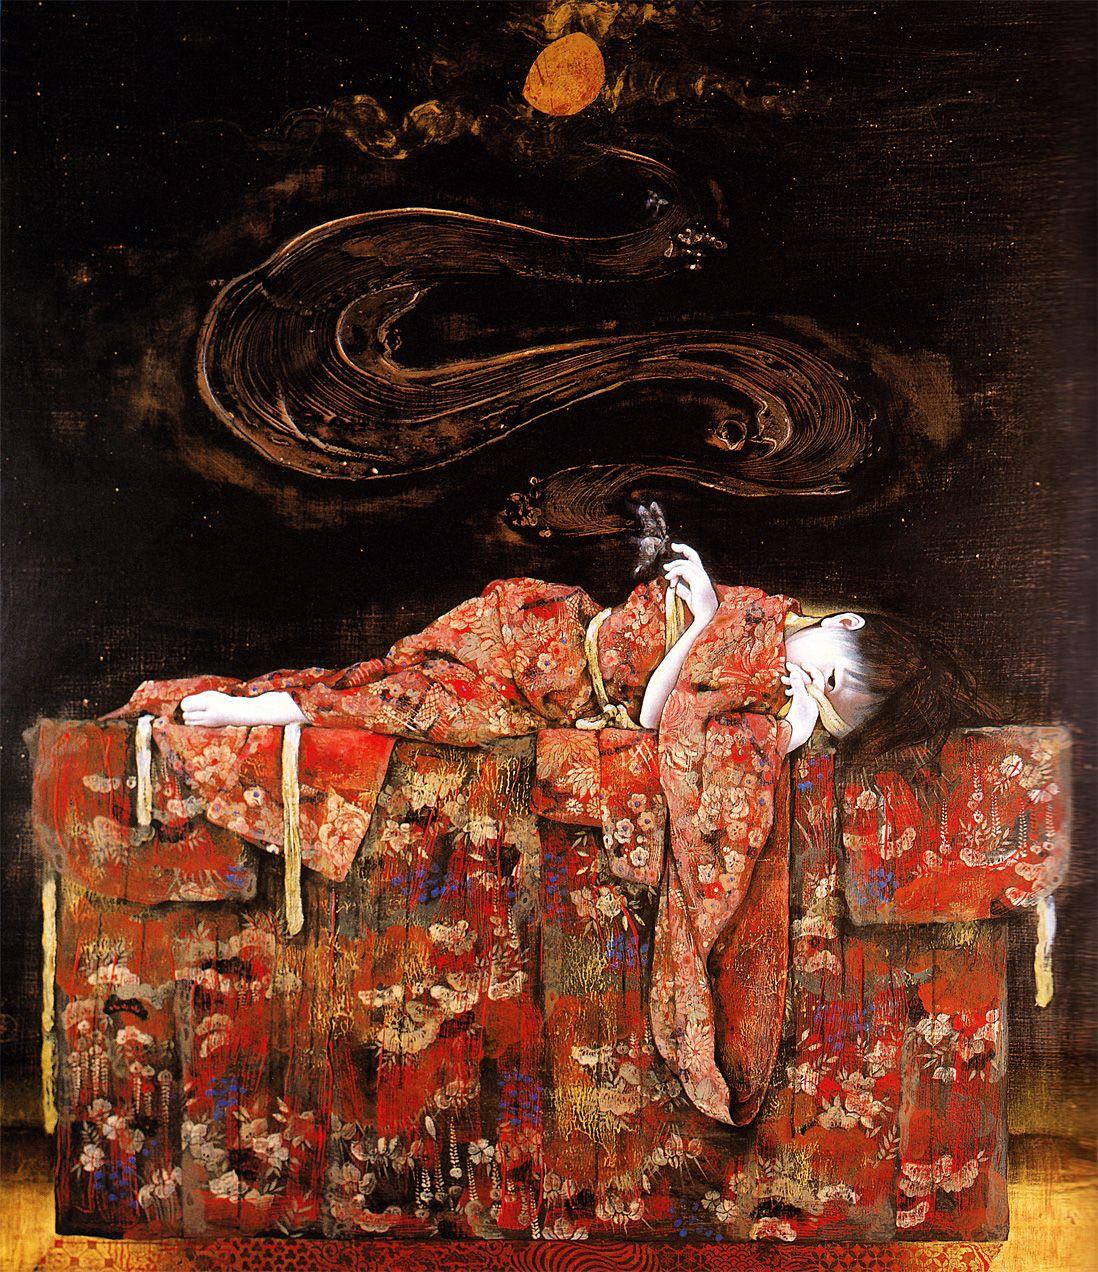 Kyosuke Chinai Valiente Y Hermoso In 2019 Japanese Art